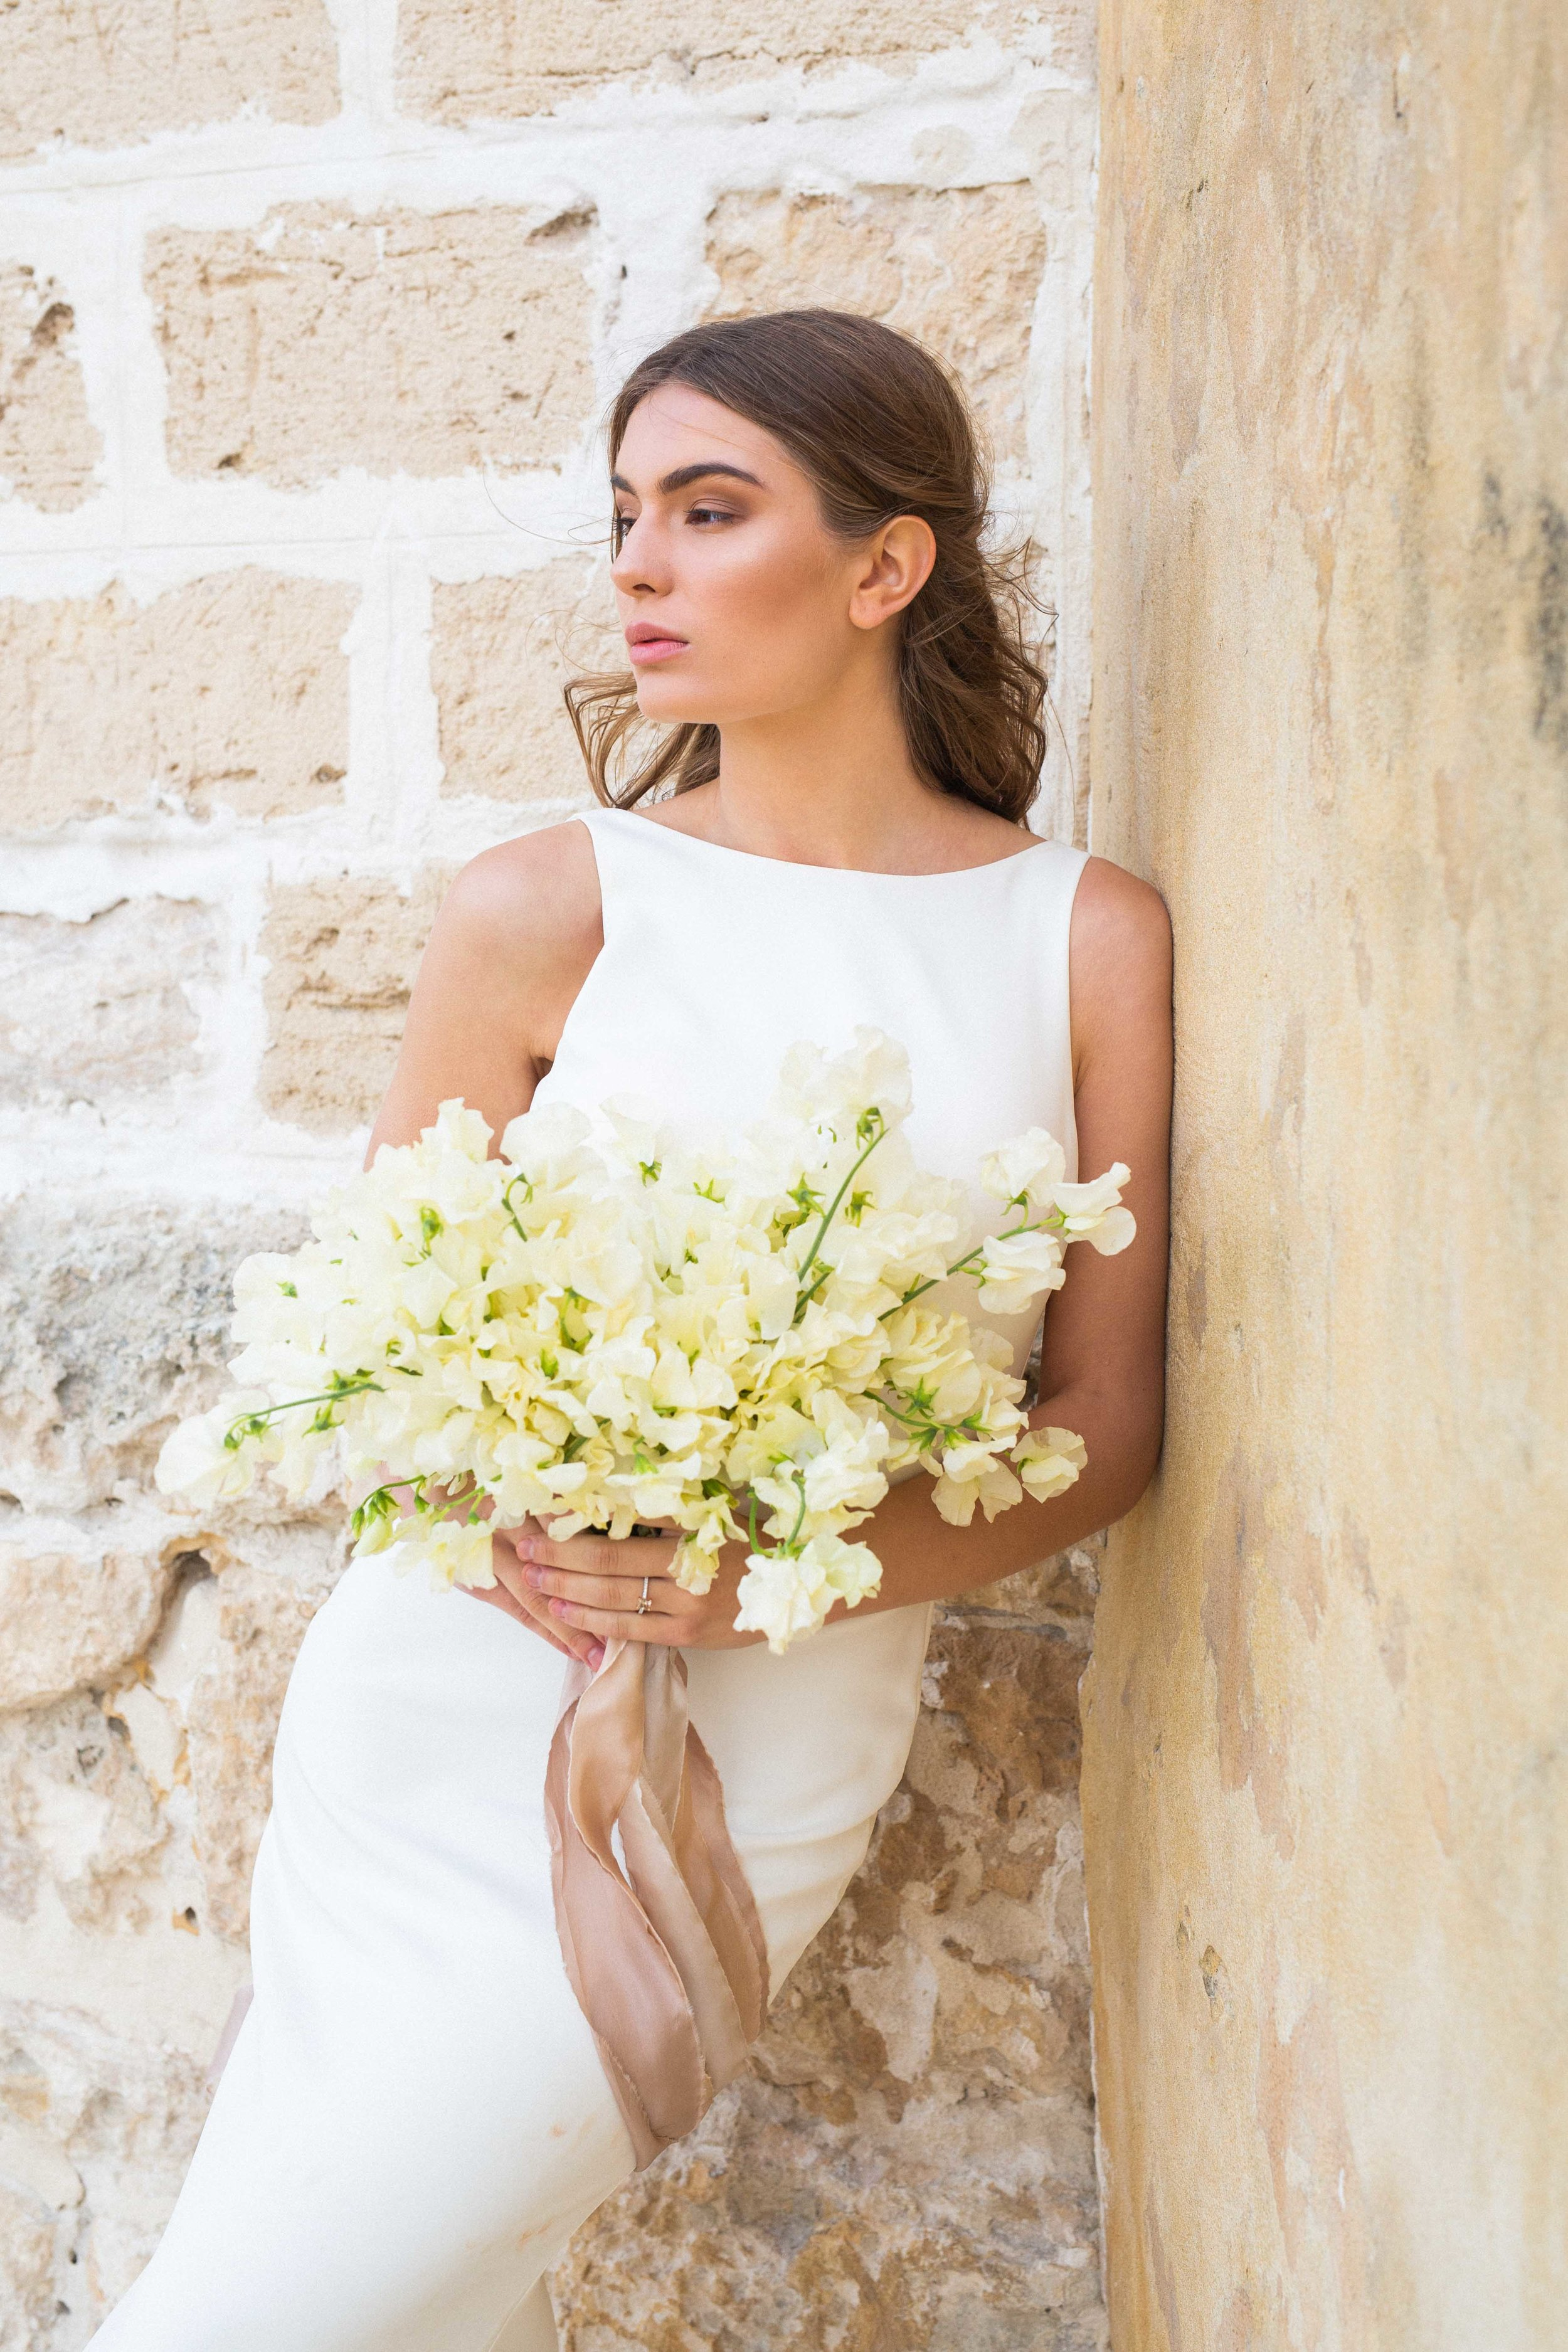 Fremantle Wedding Walk - Blue HQ, Perth Wedding Venue -  Tessa Kit Photography -JQ9A9259.jpg